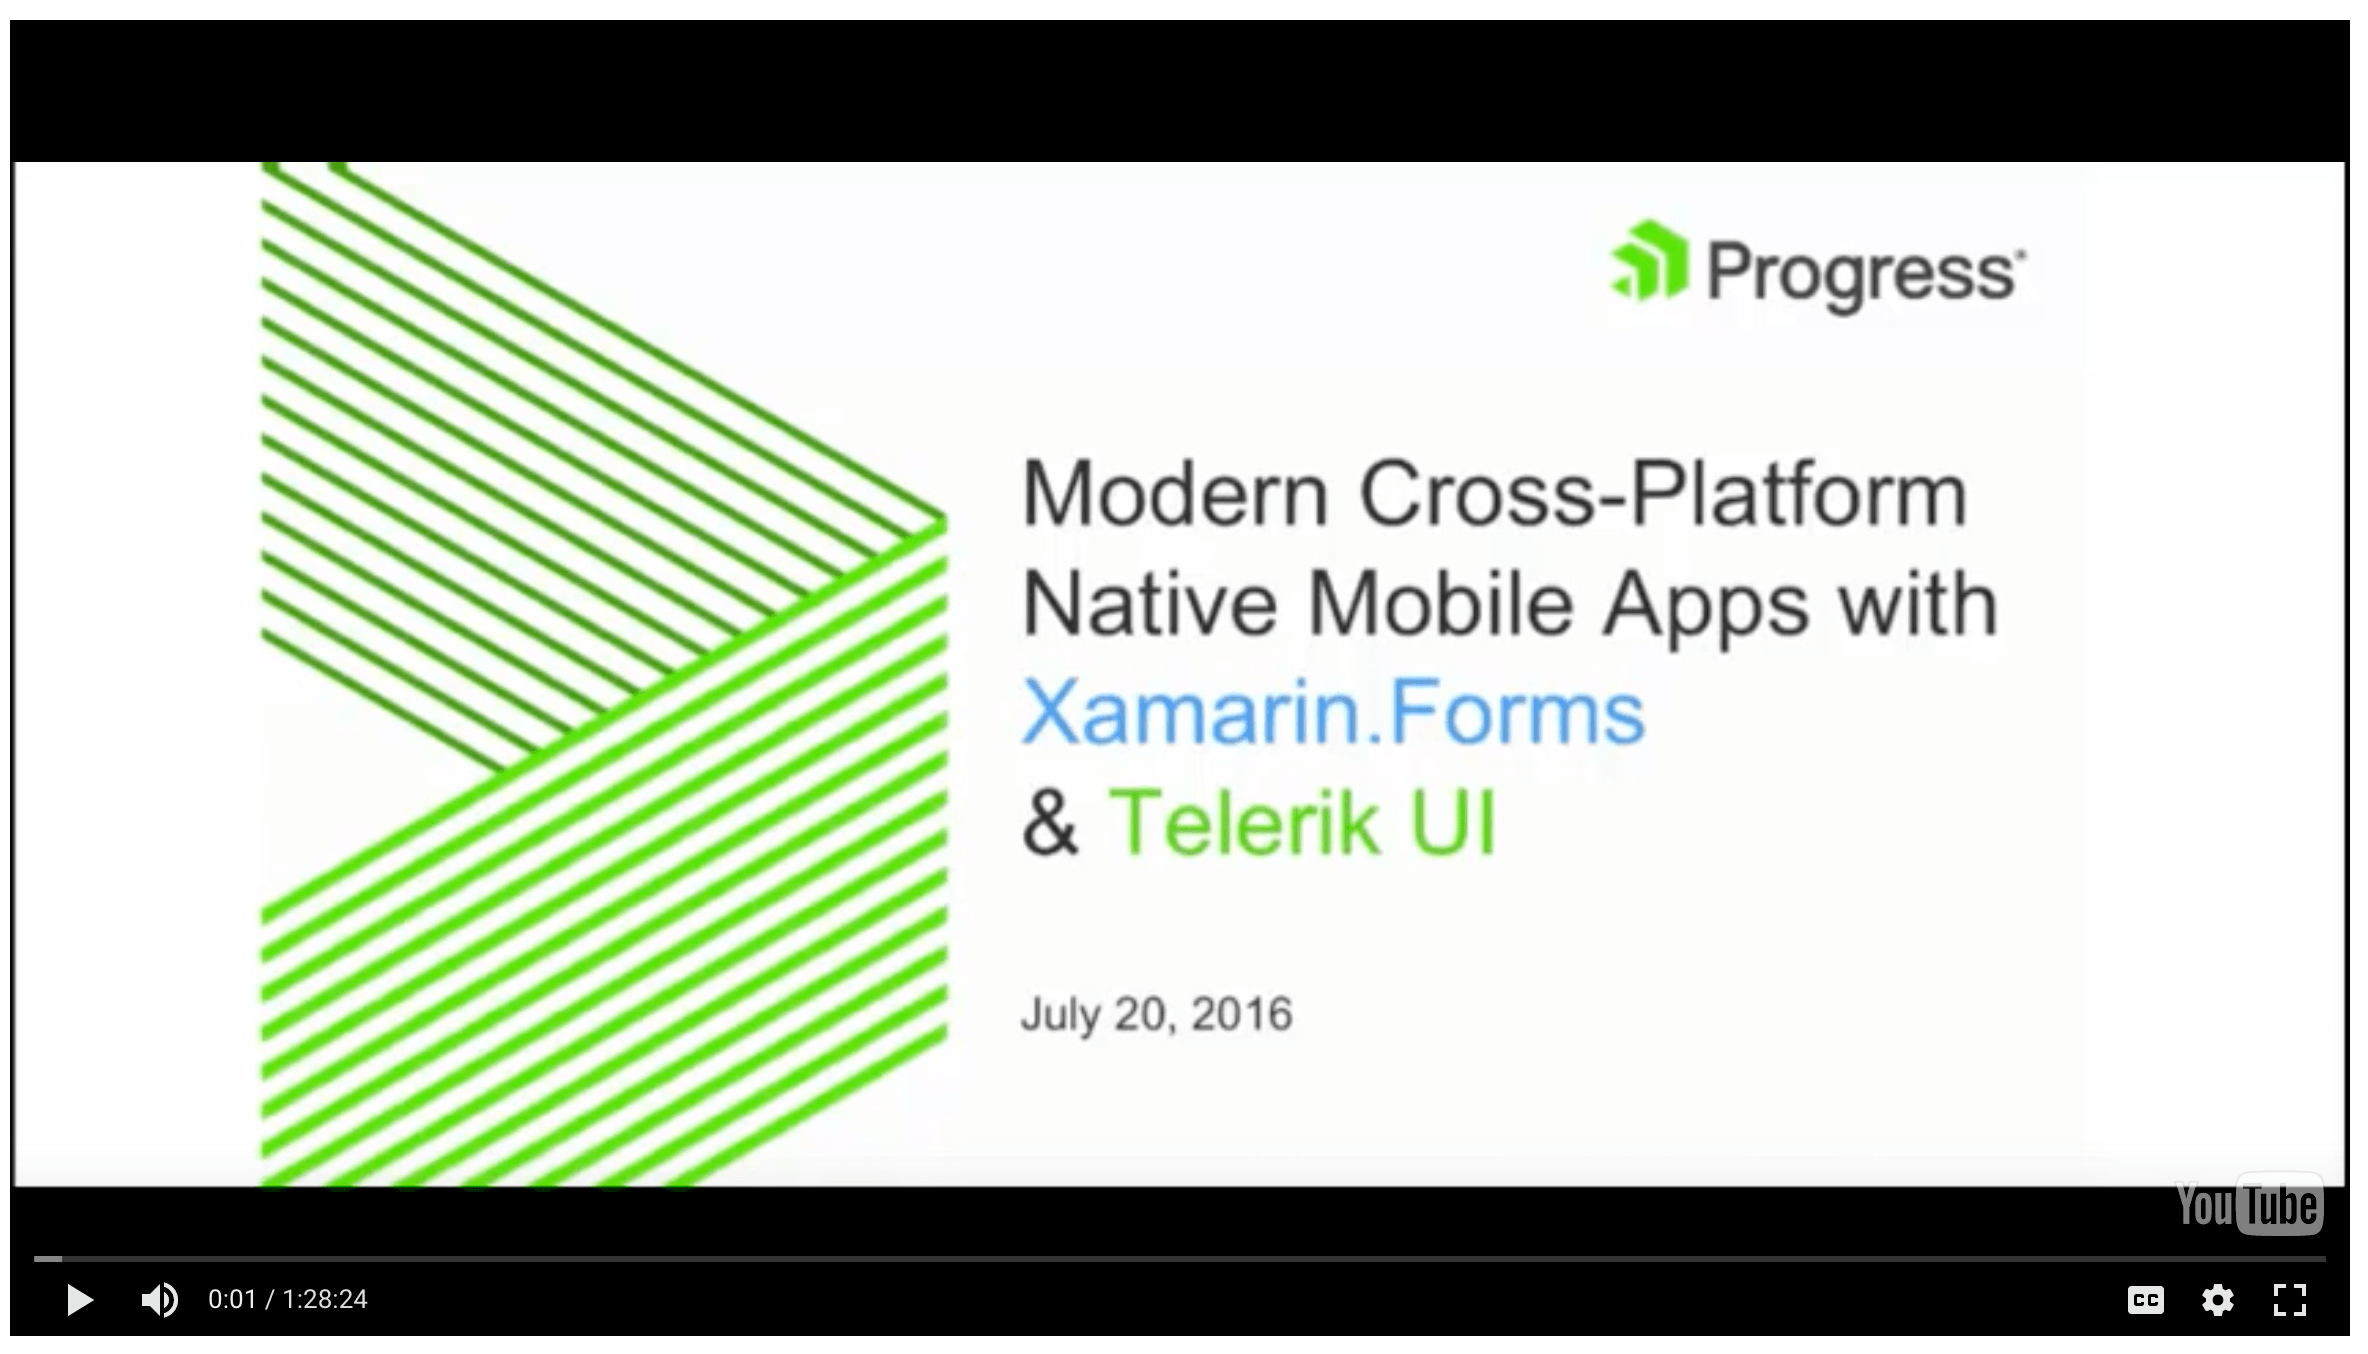 Modern X-Platform Apps with Xamarin Forms & Telerik UI Webinar